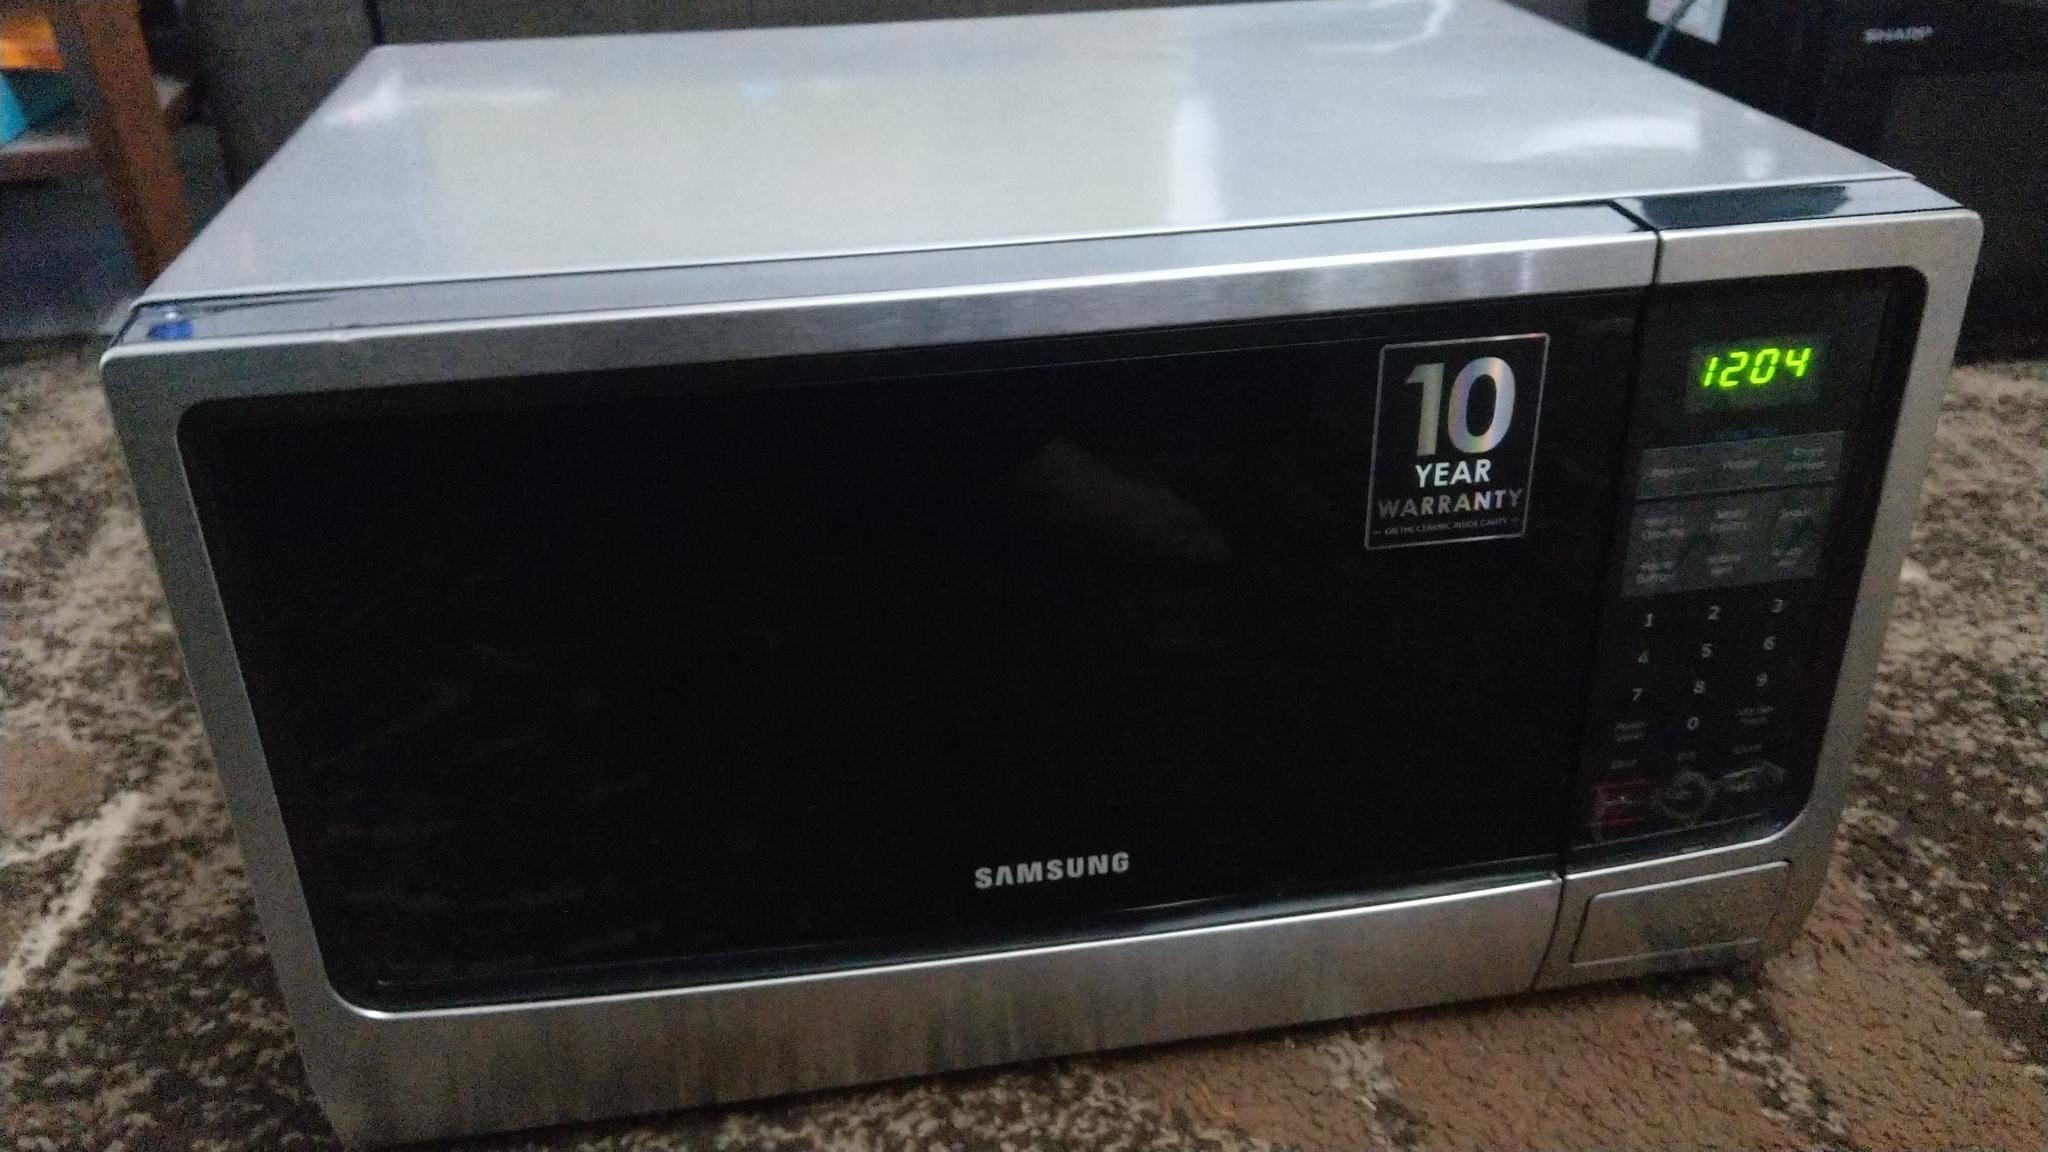 Samsung microwave 32litre as new still in warranty